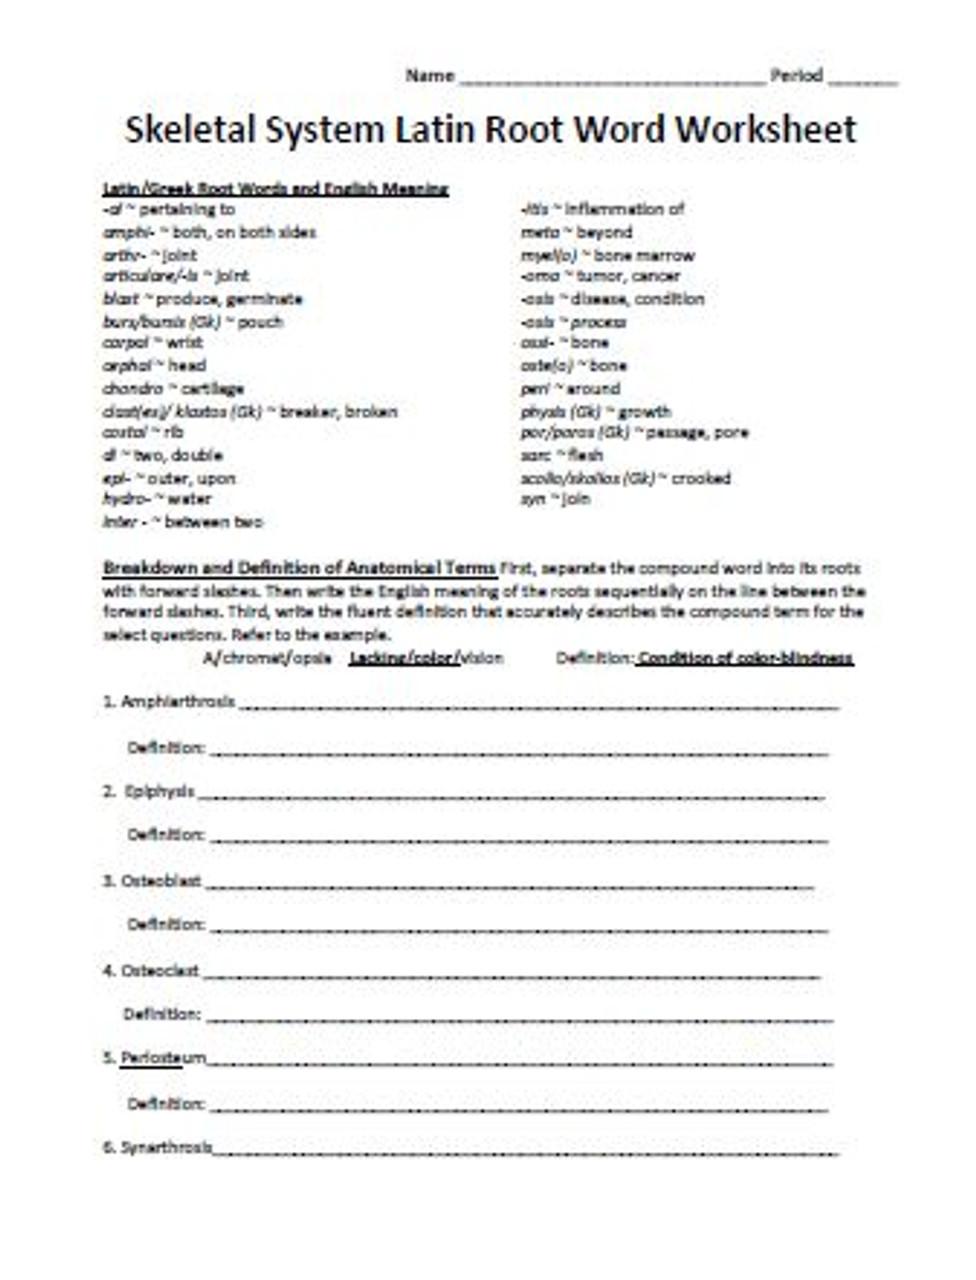 medium resolution of Skeletal System Latin Root Word Worksheet - Amped Up Learning